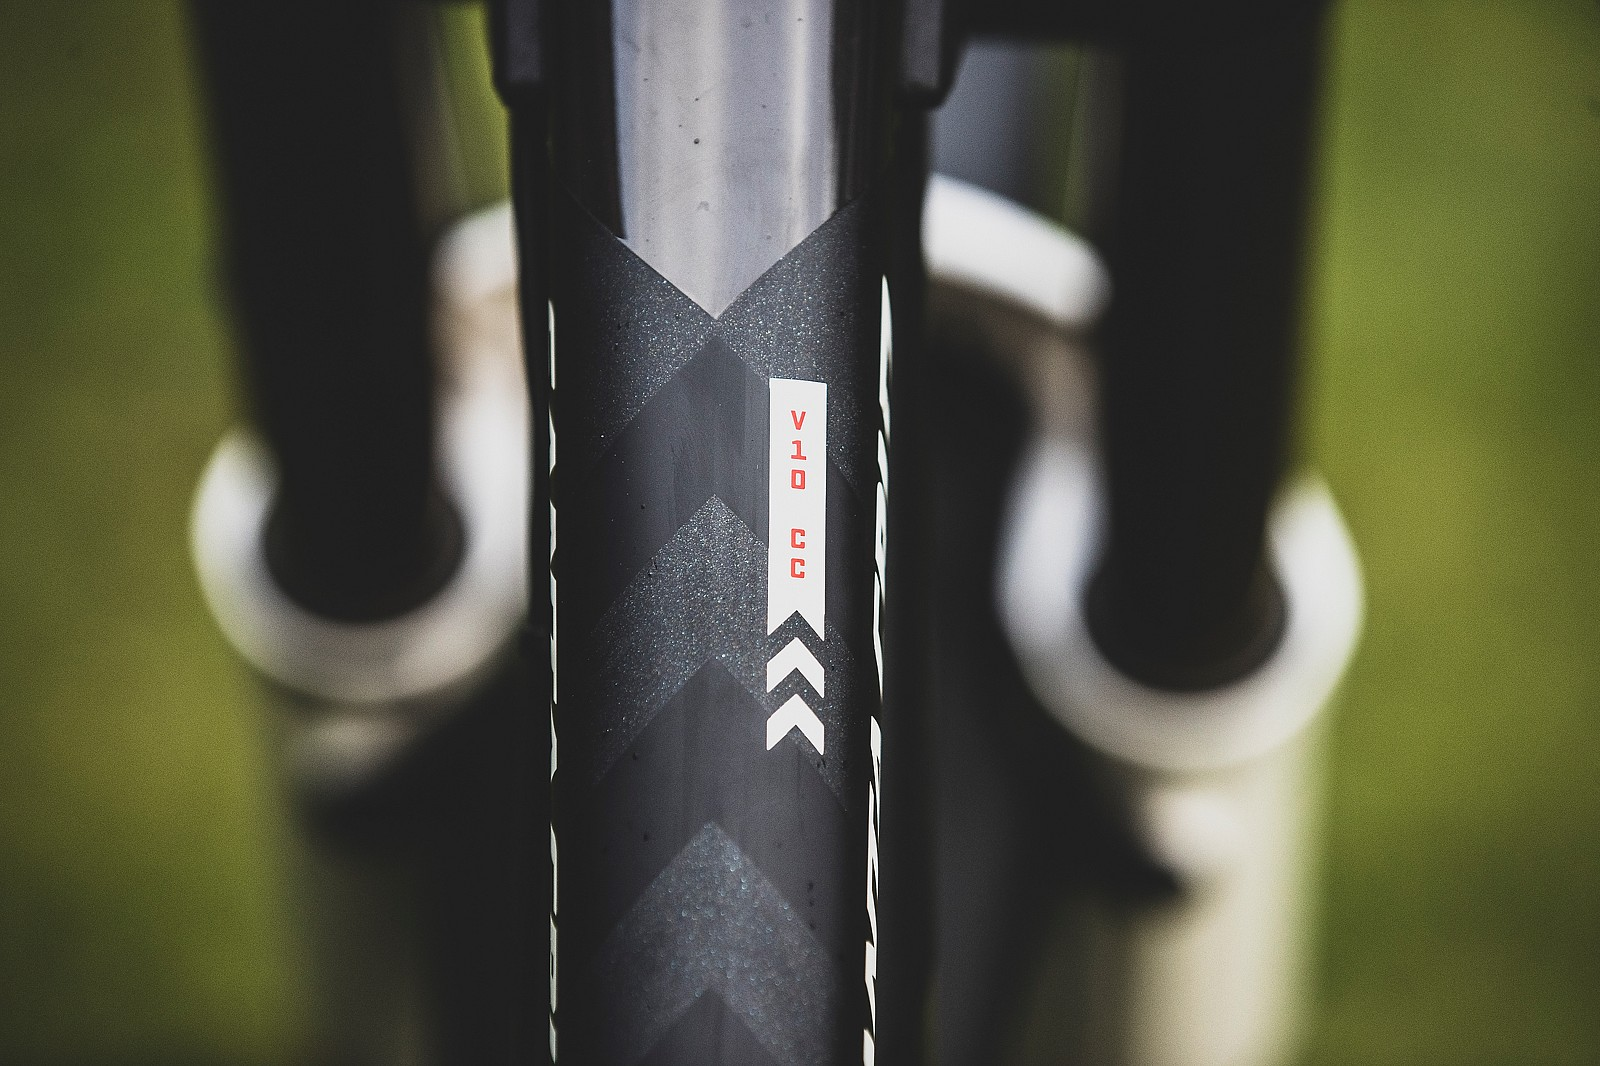 V10 CC XXXXXL - WORLD CHAMPS BIKE - Greg Minnaar's Santa Cruz V10 - Mountain Biking Pictures - Vital MTB